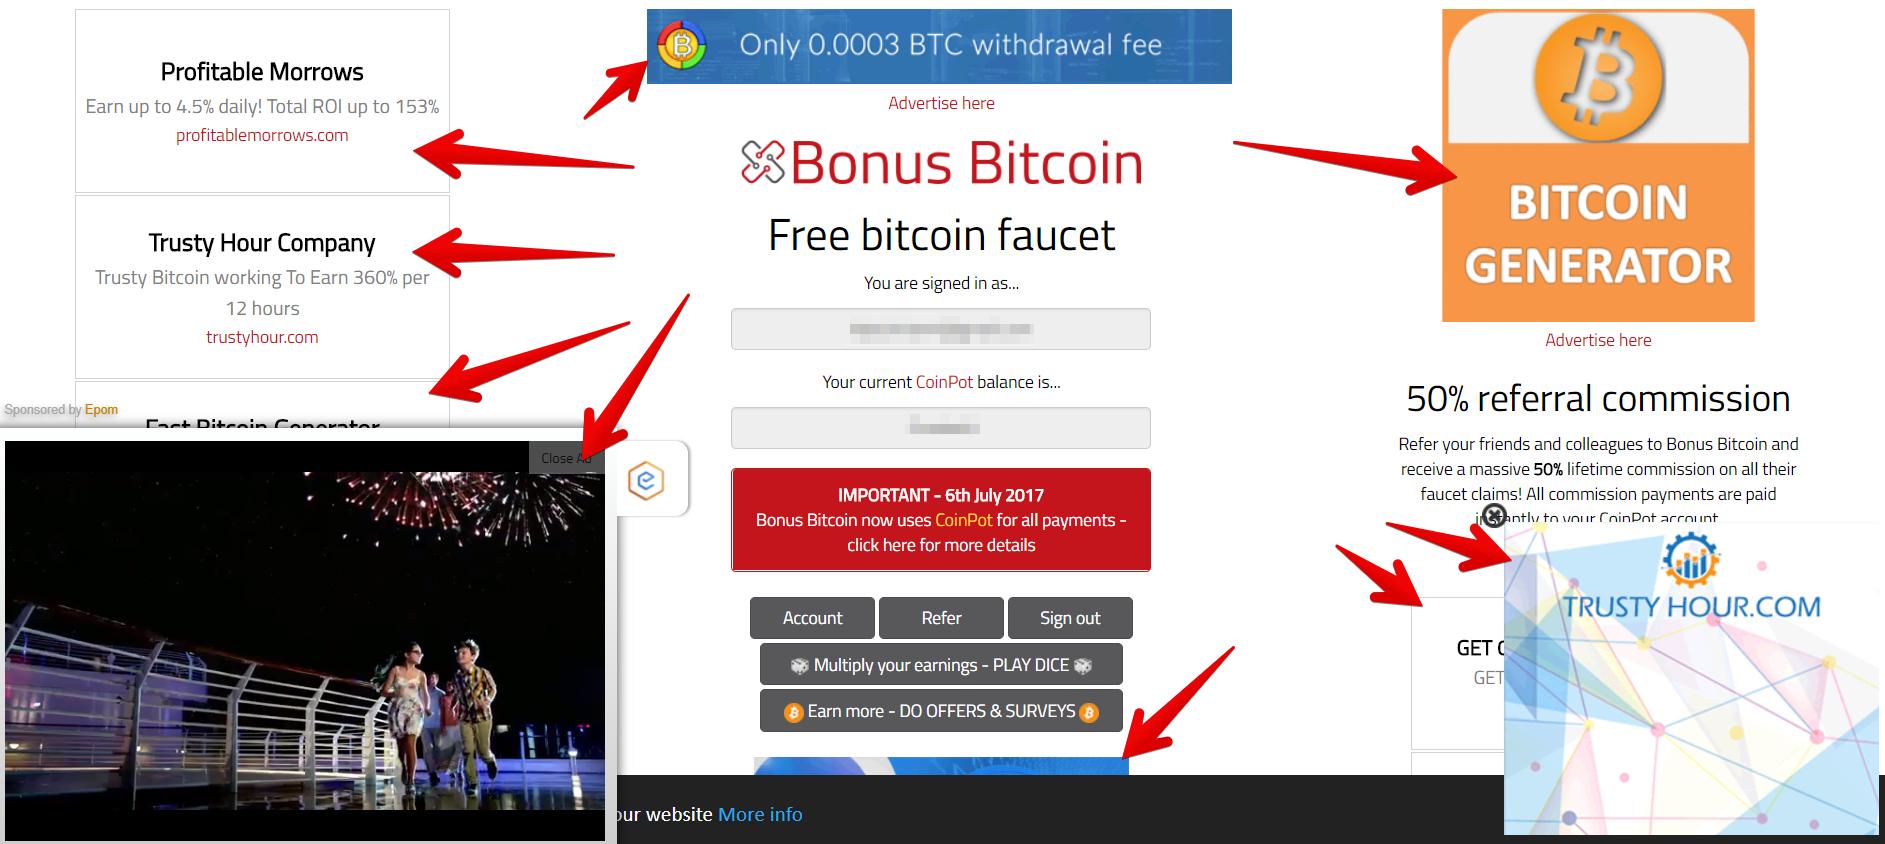 Bonus Bitcoin ads